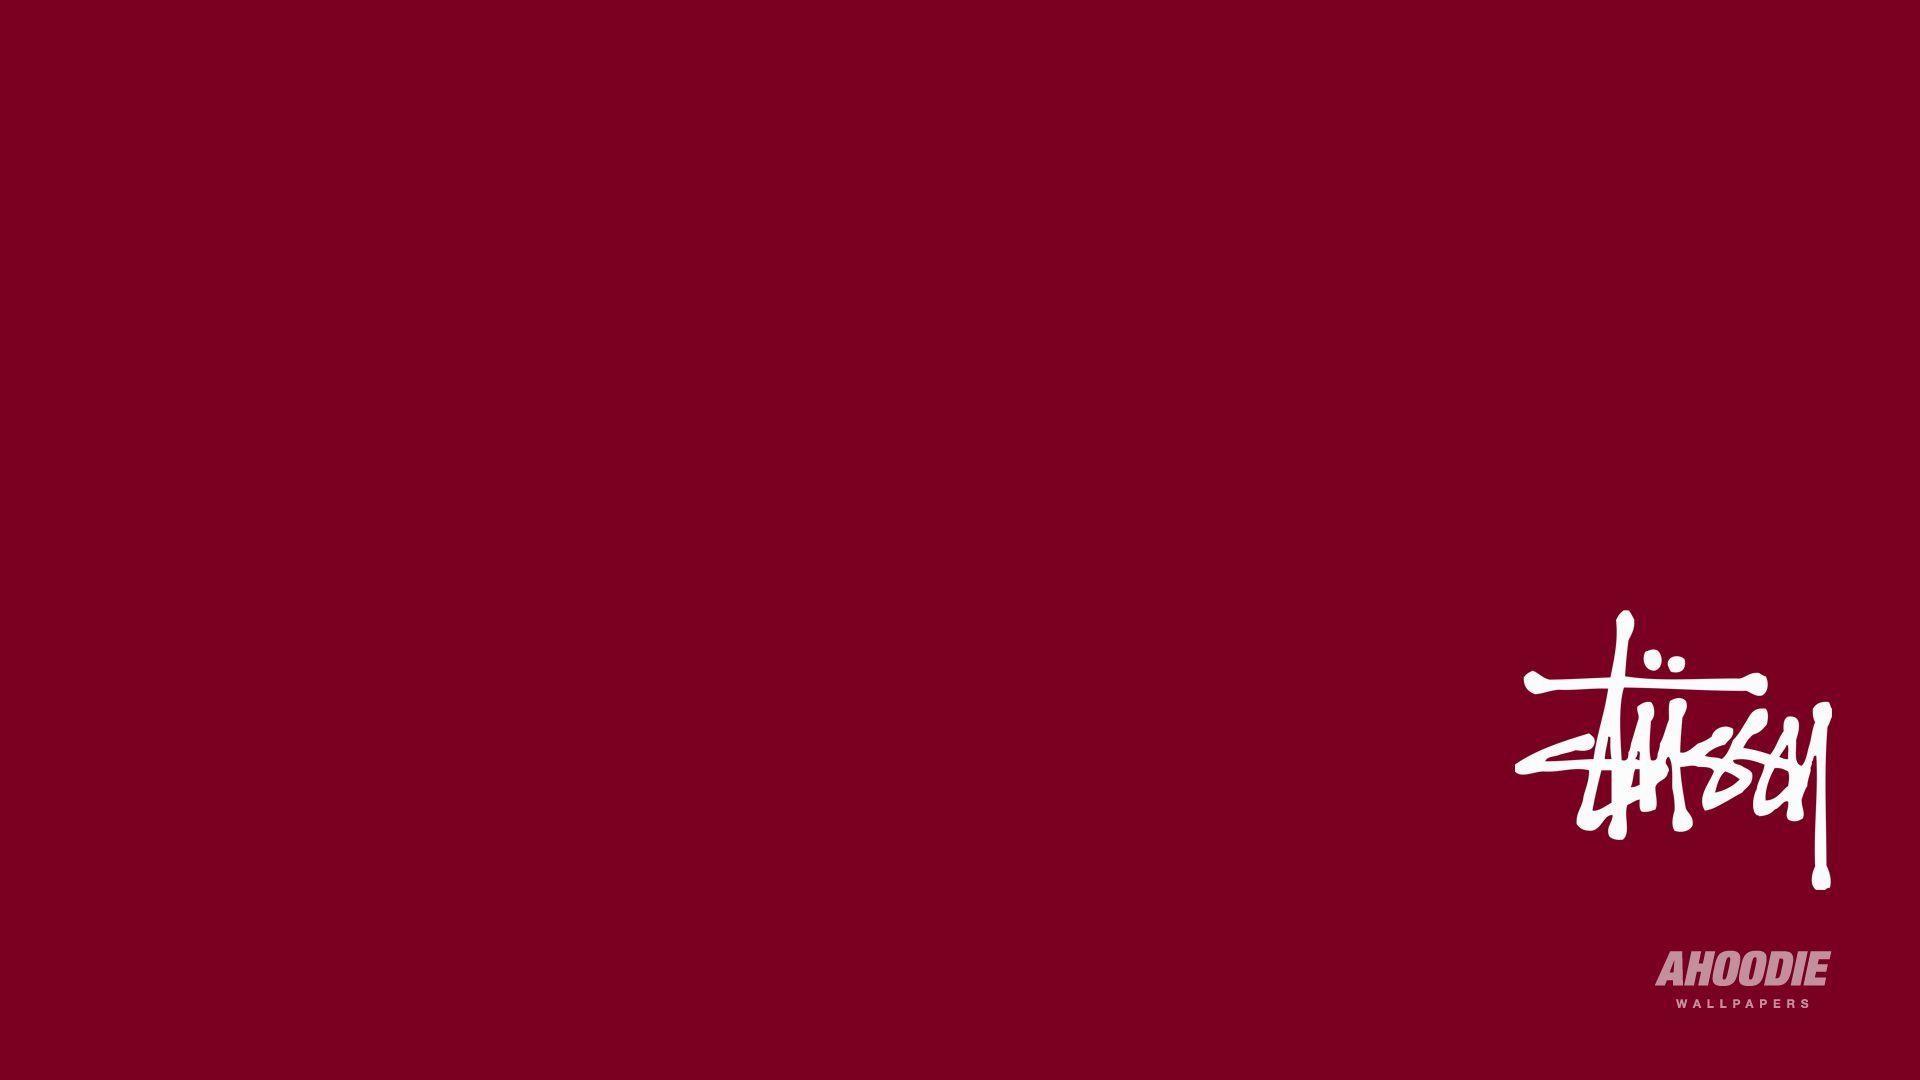 Rose Wallpaper Hypebeast Laptop   Mary Rosh 1920x1080